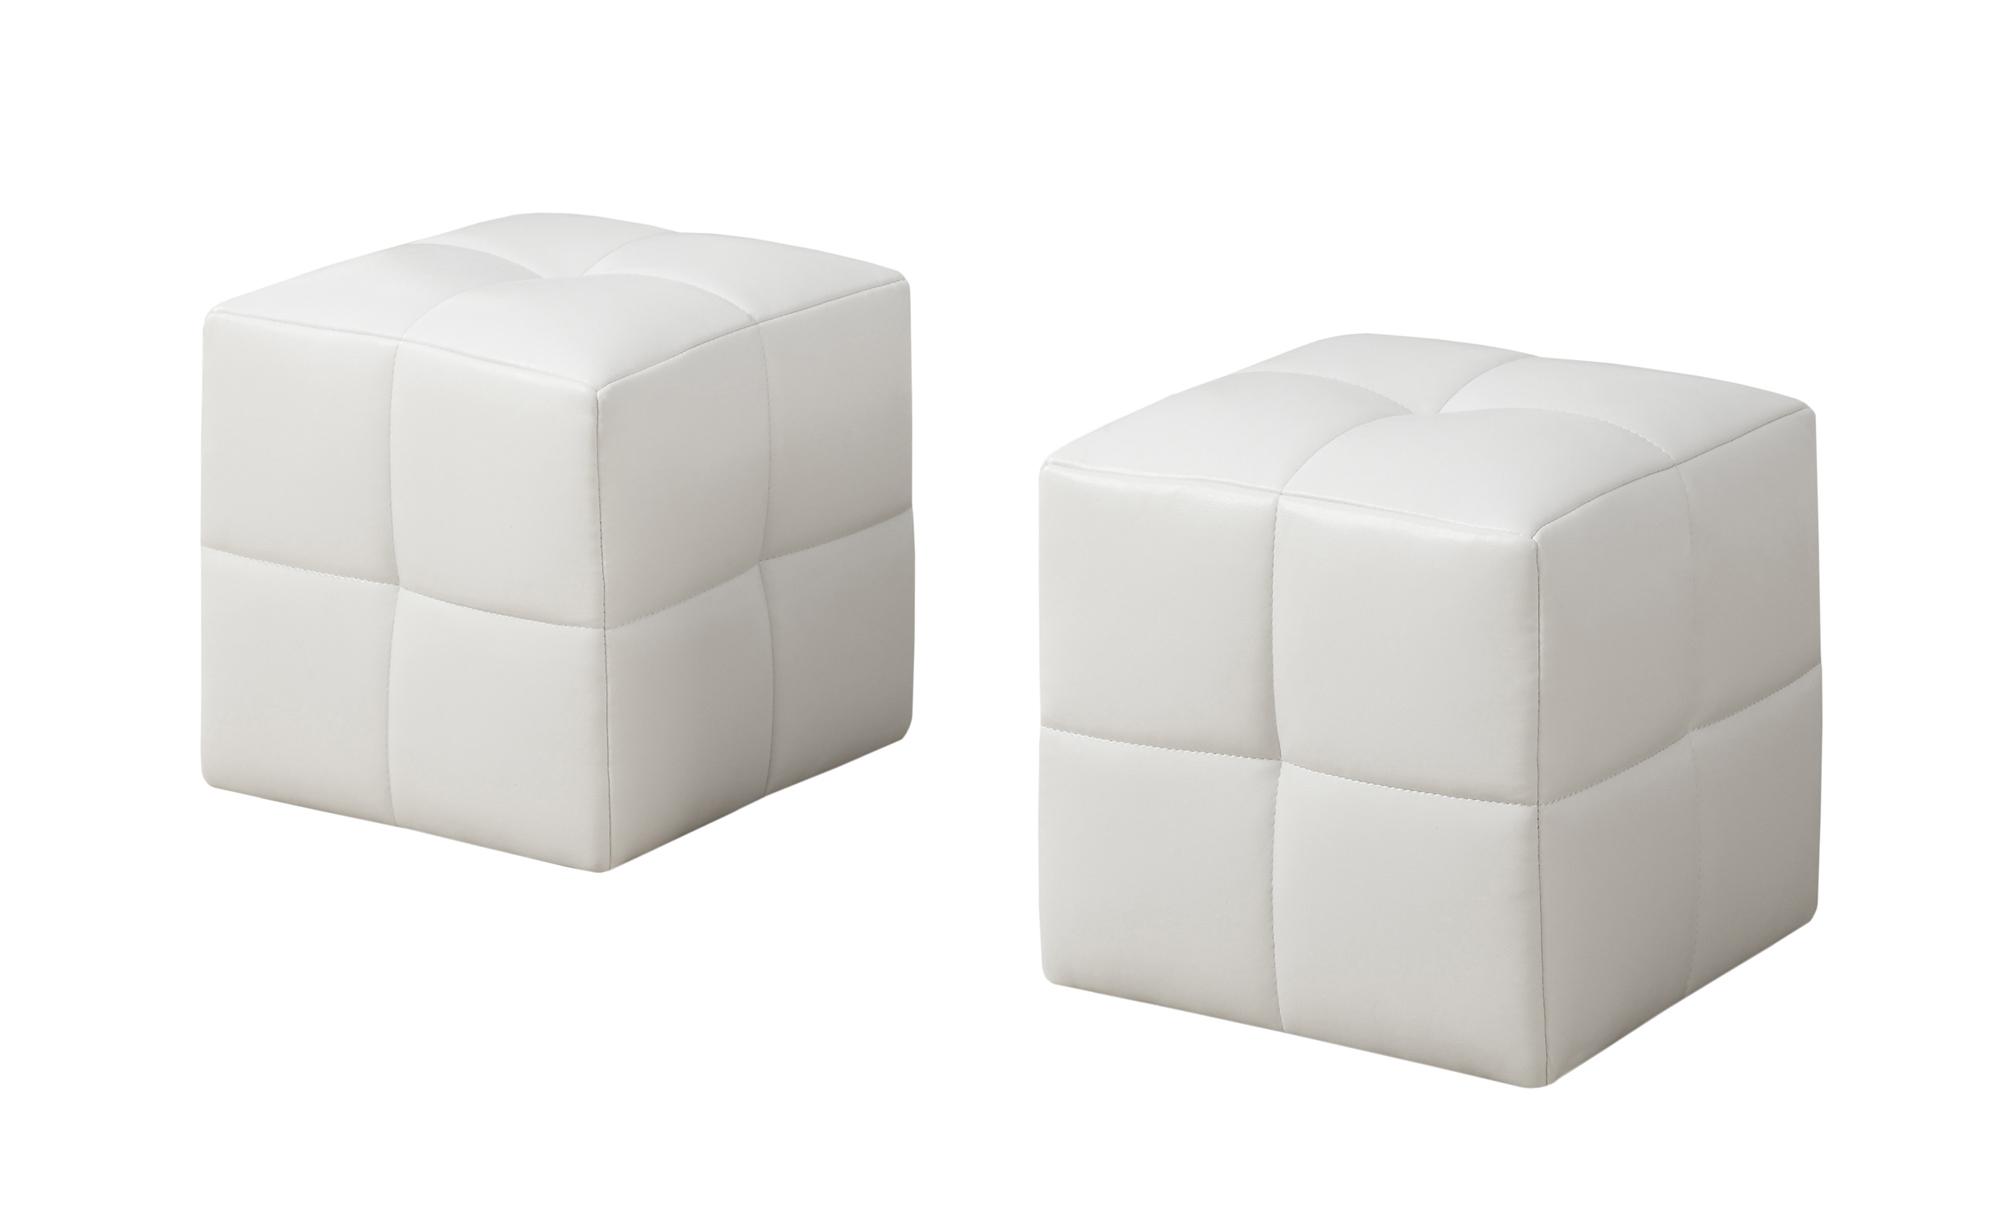 "12"" x 12"" x 12"" White  Leather Look  Ottoman 2pcs Set"